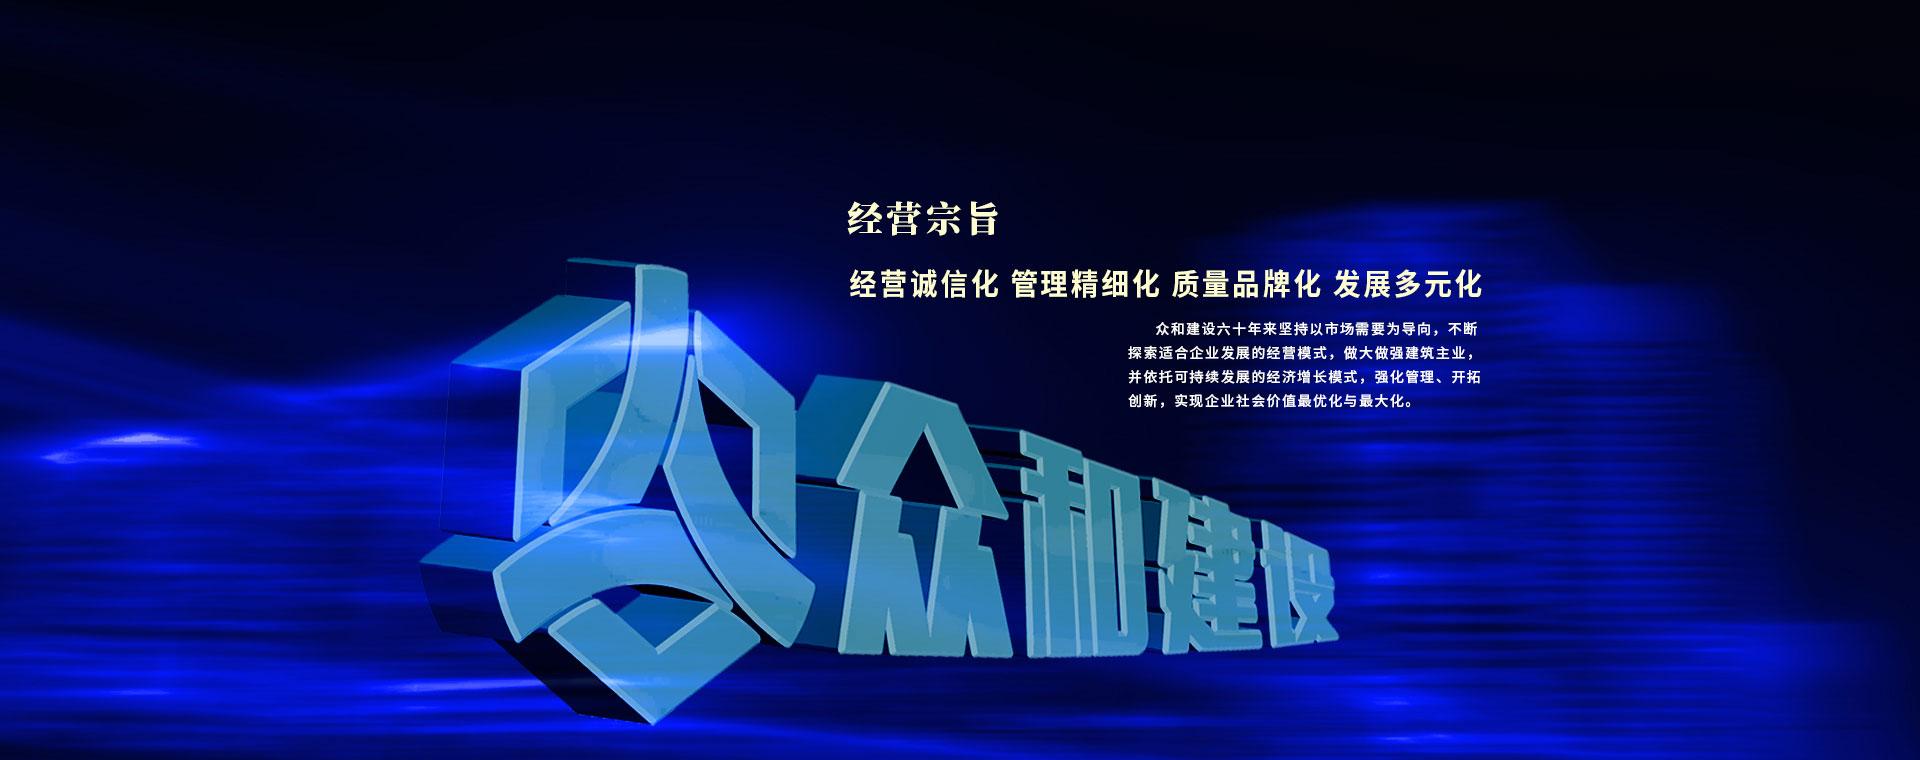 云南城必威体育官方和betway体育